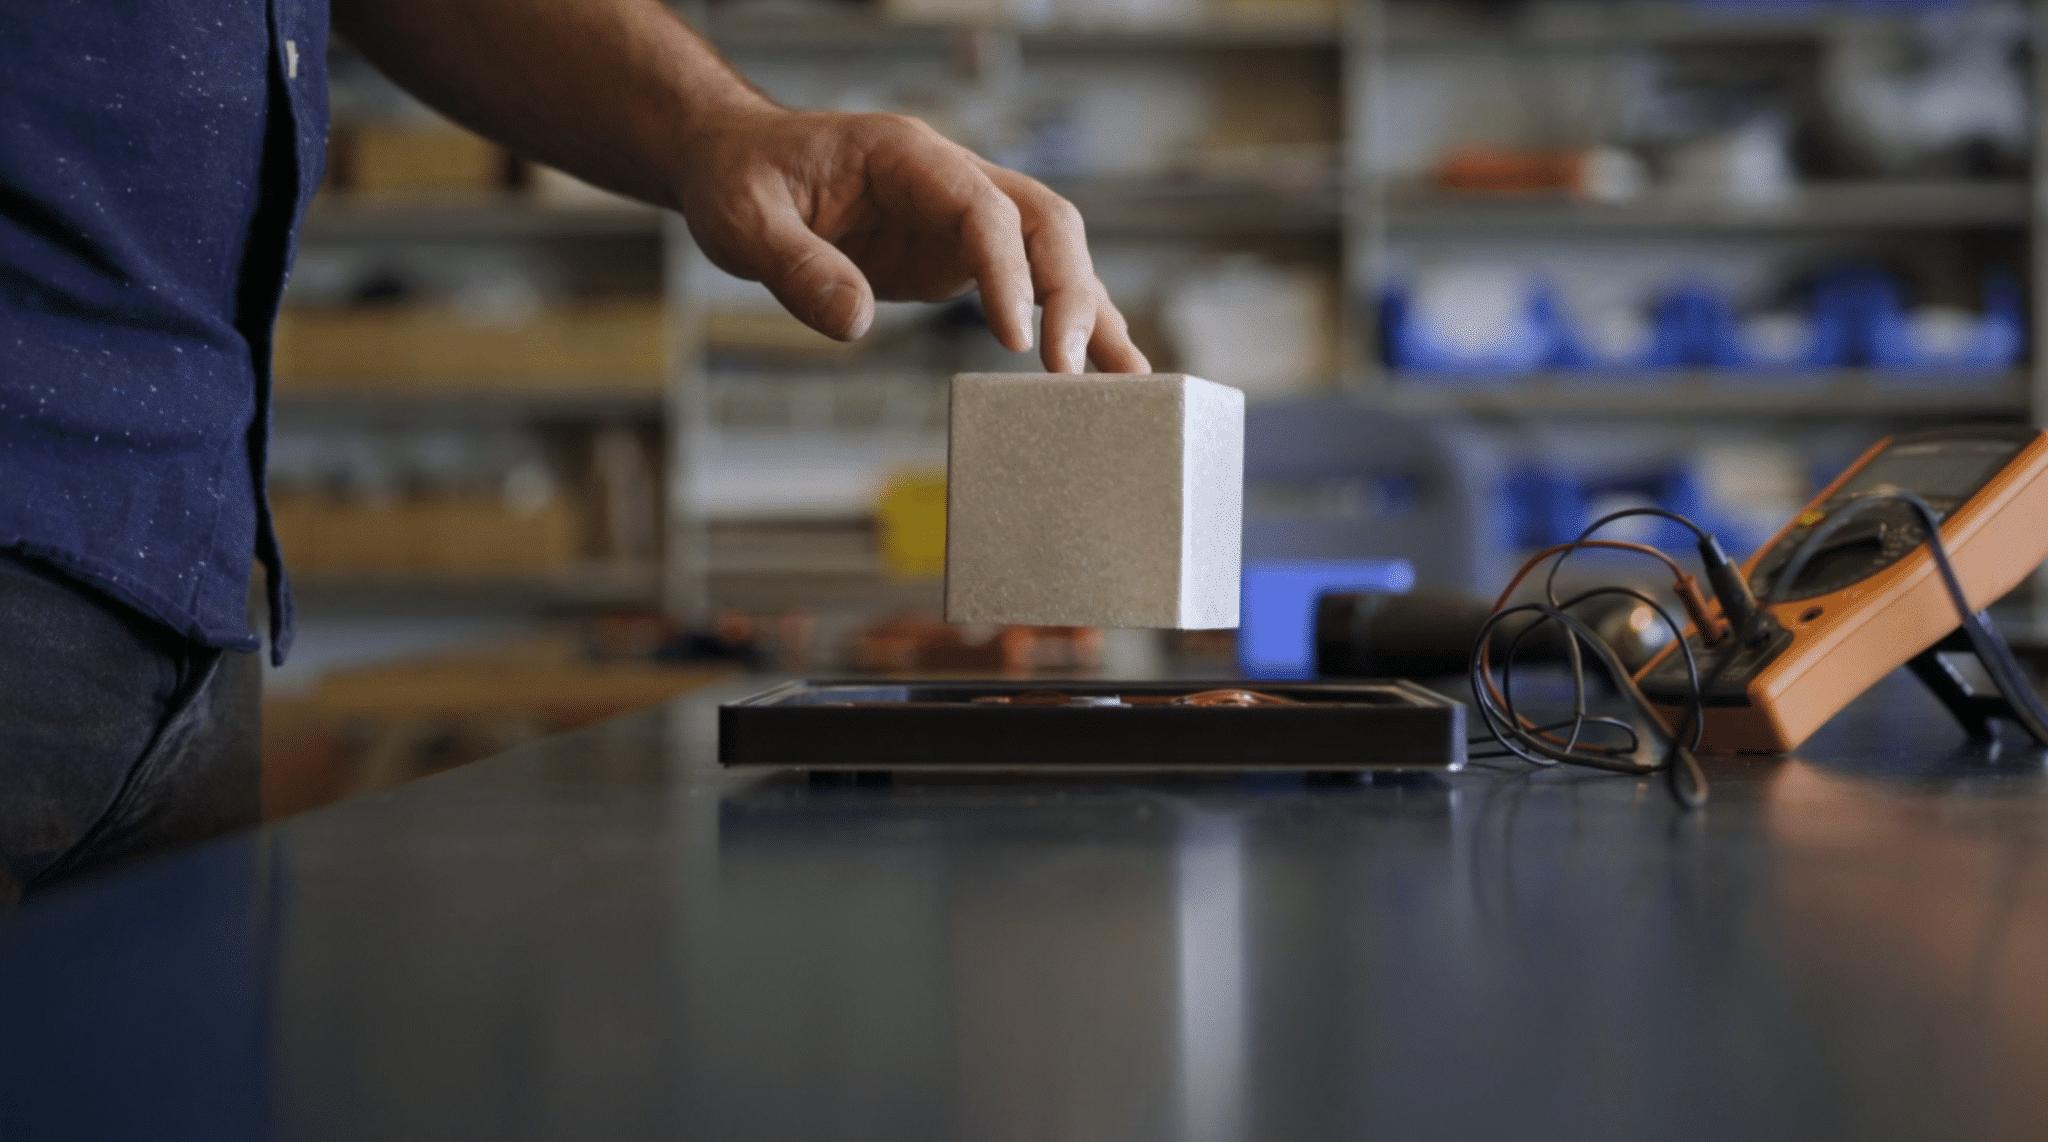 levitation technology